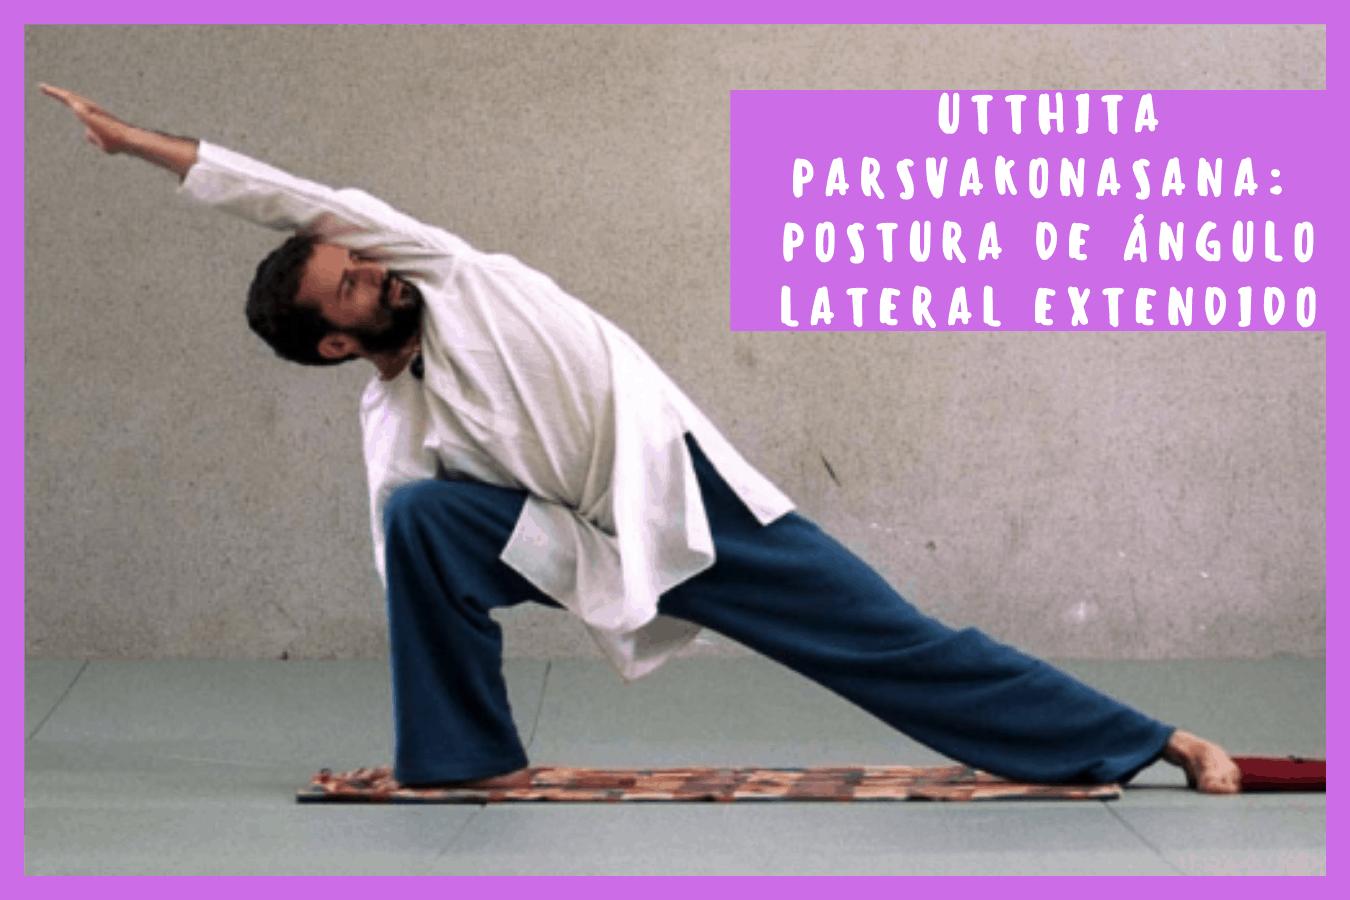 Utthita Parsvakonasana:Posturade ángulo lateral extendido